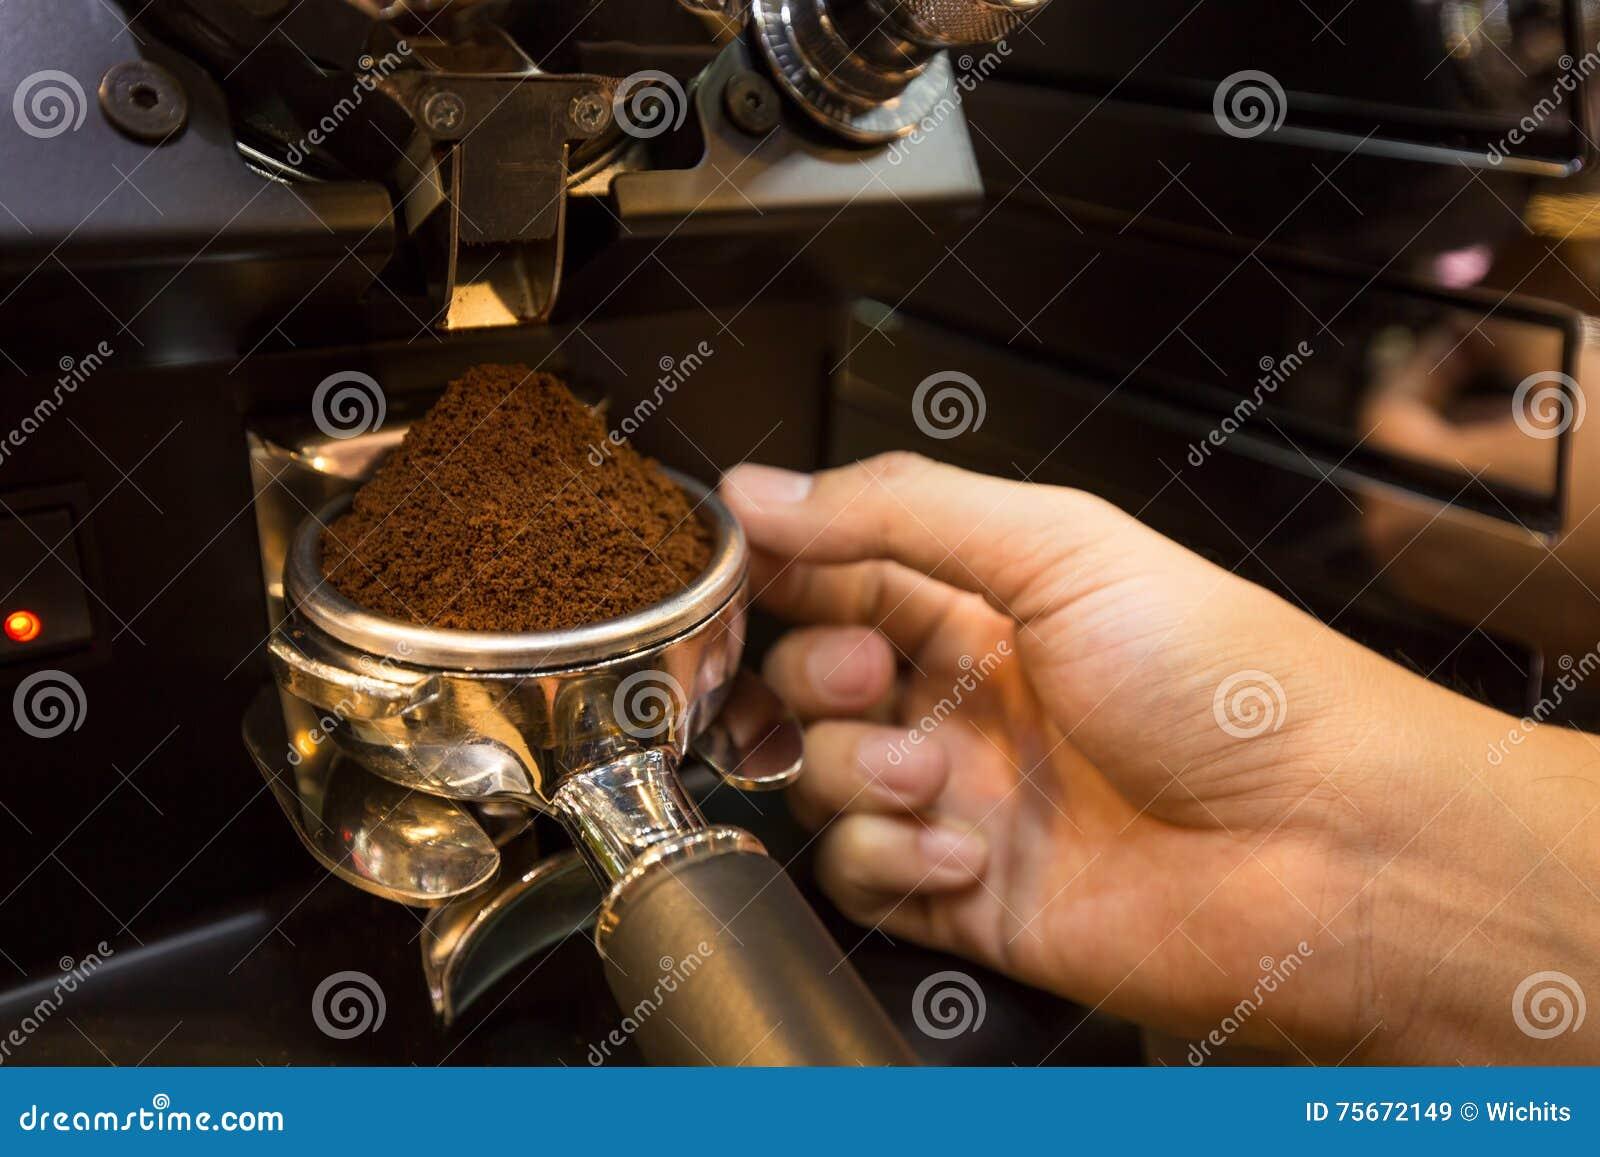 Prepare Espresso Powder Stock Image Image Of Latte Closeup